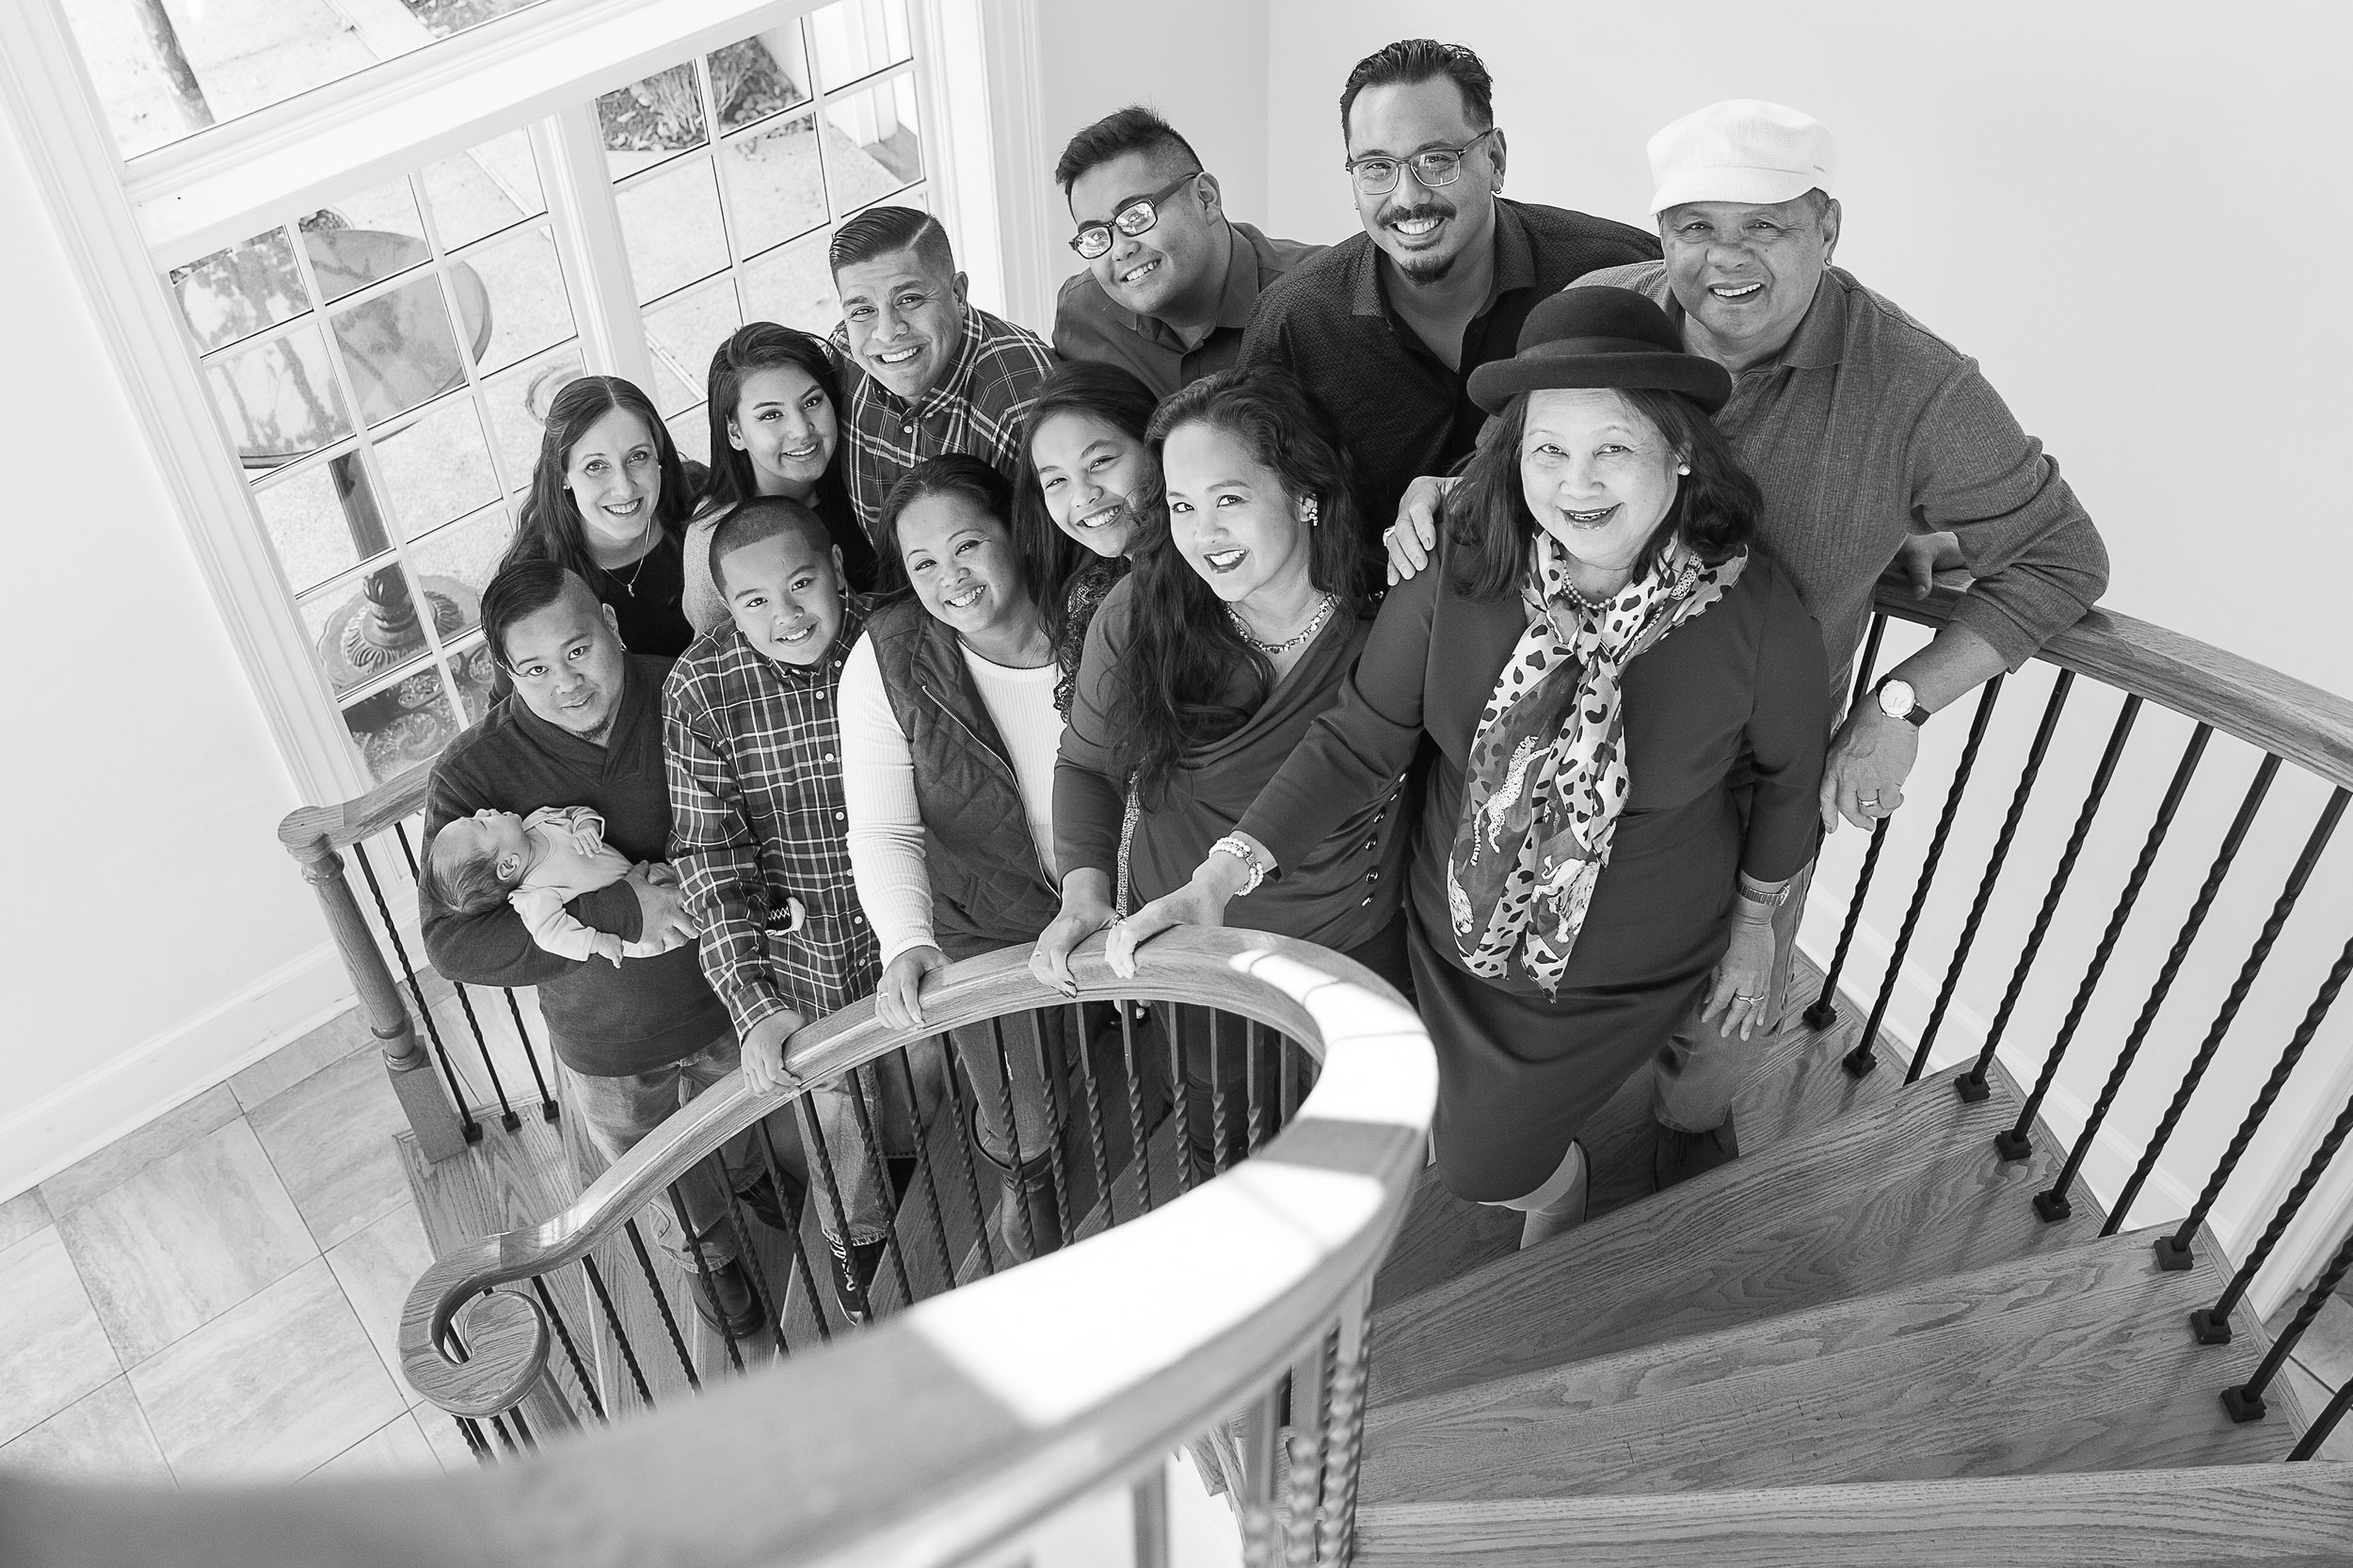 04-JEB-Multi-Family-Portrait-Kim-Pham-Clark-Photography.jpg